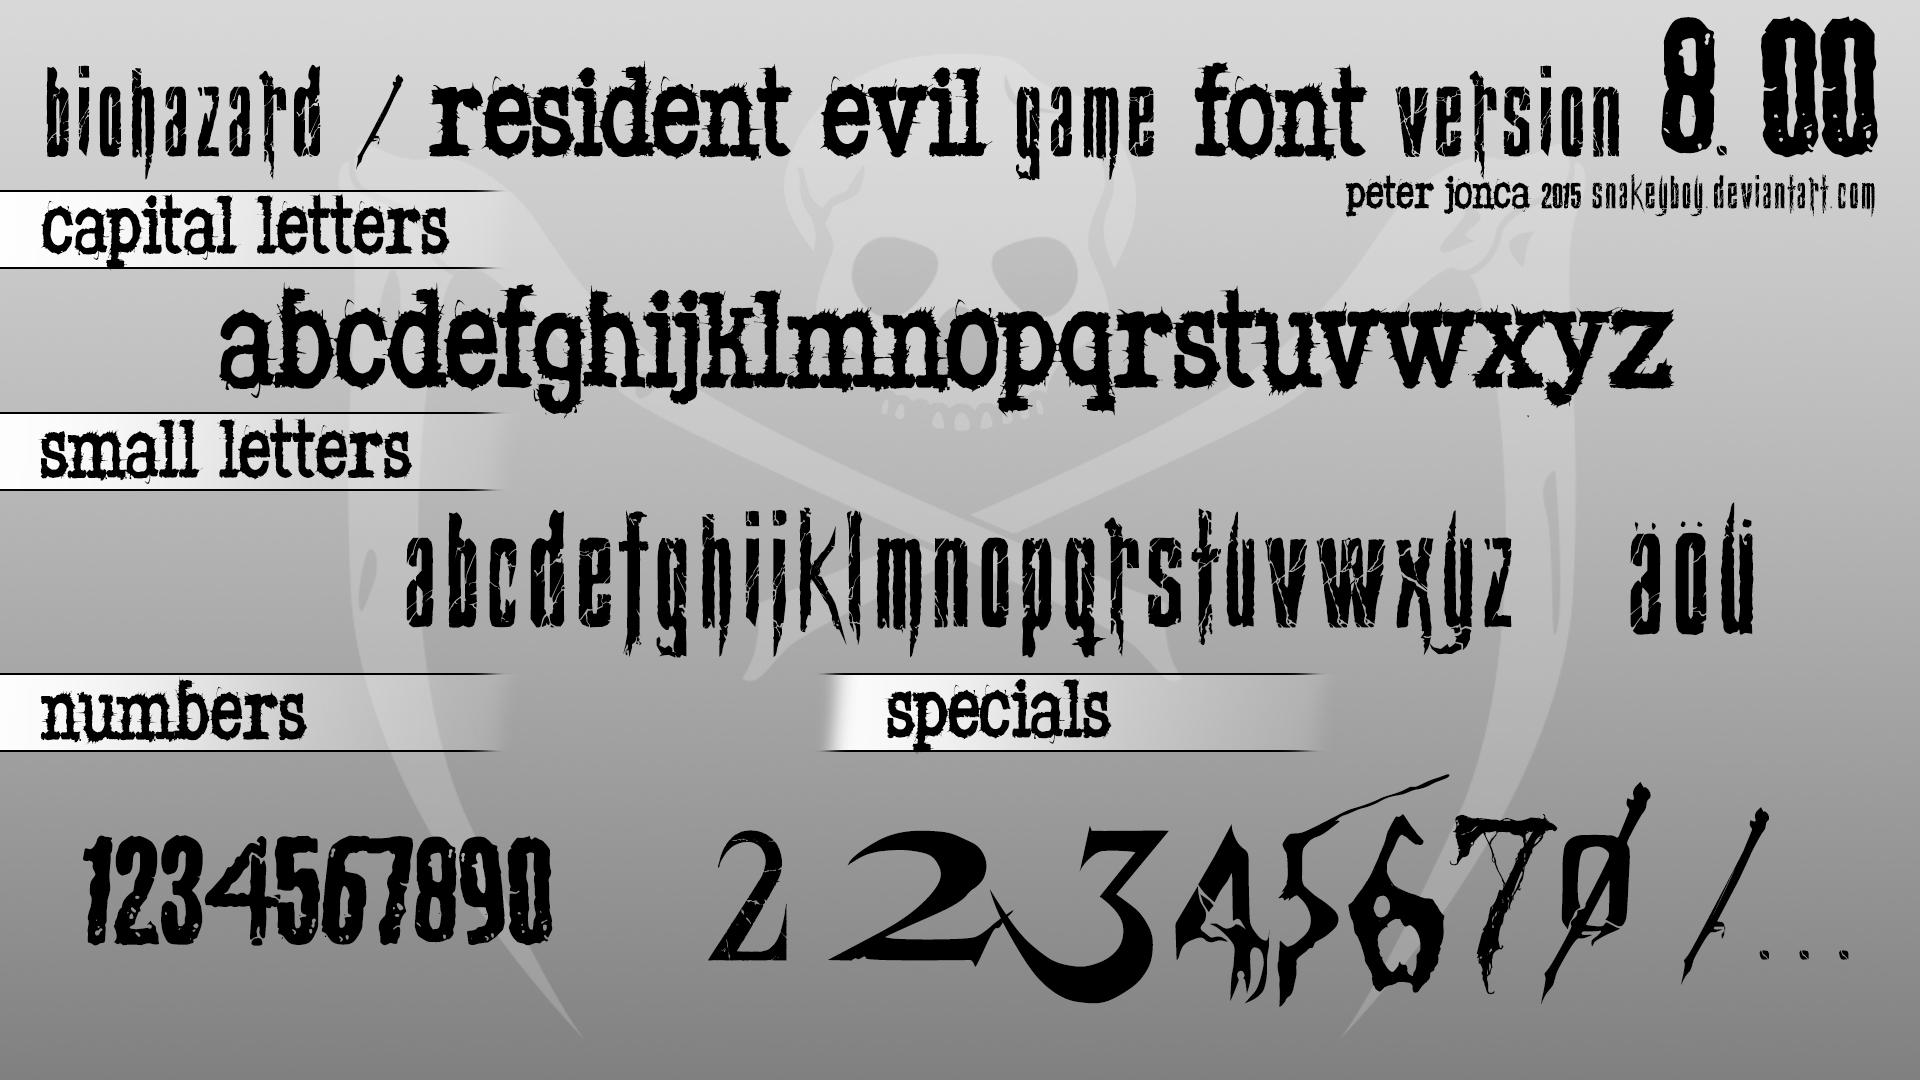 Biohazard Resident Evil Game Font Version 8 00 By Snakeyboy On Deviantart